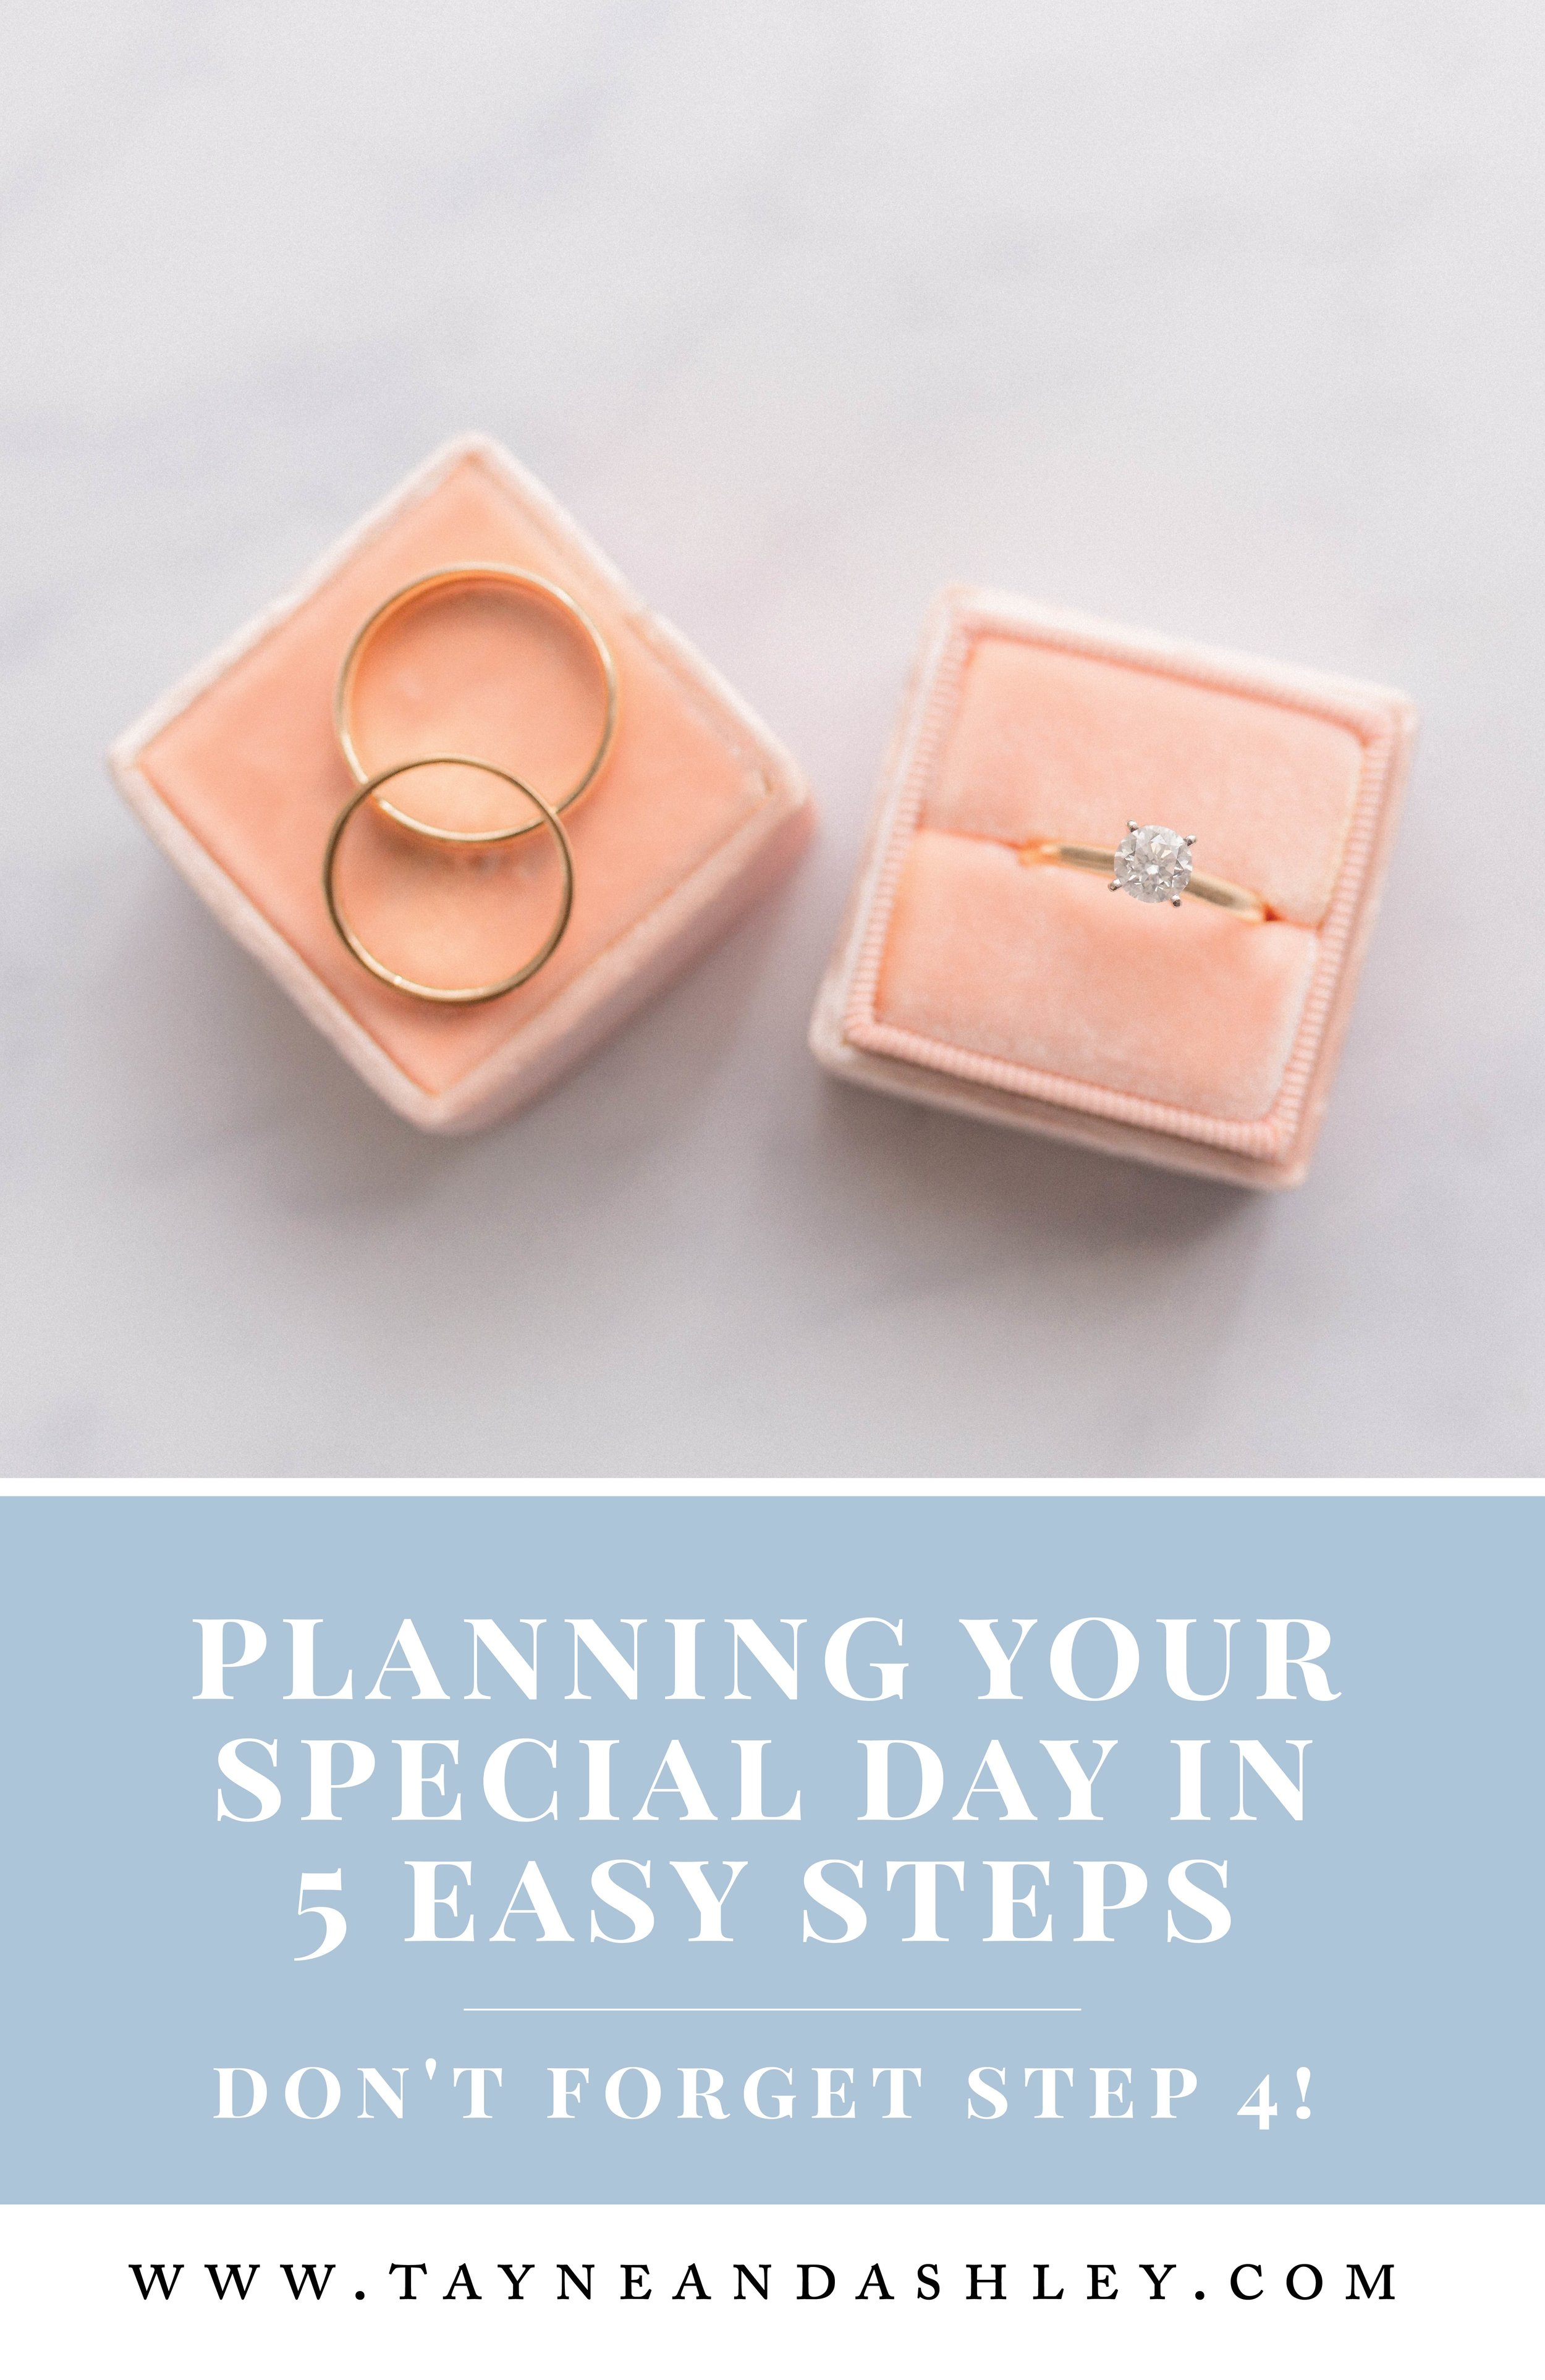 planning-your-wedding-blog-Tayne-and-ashley-01.jpg